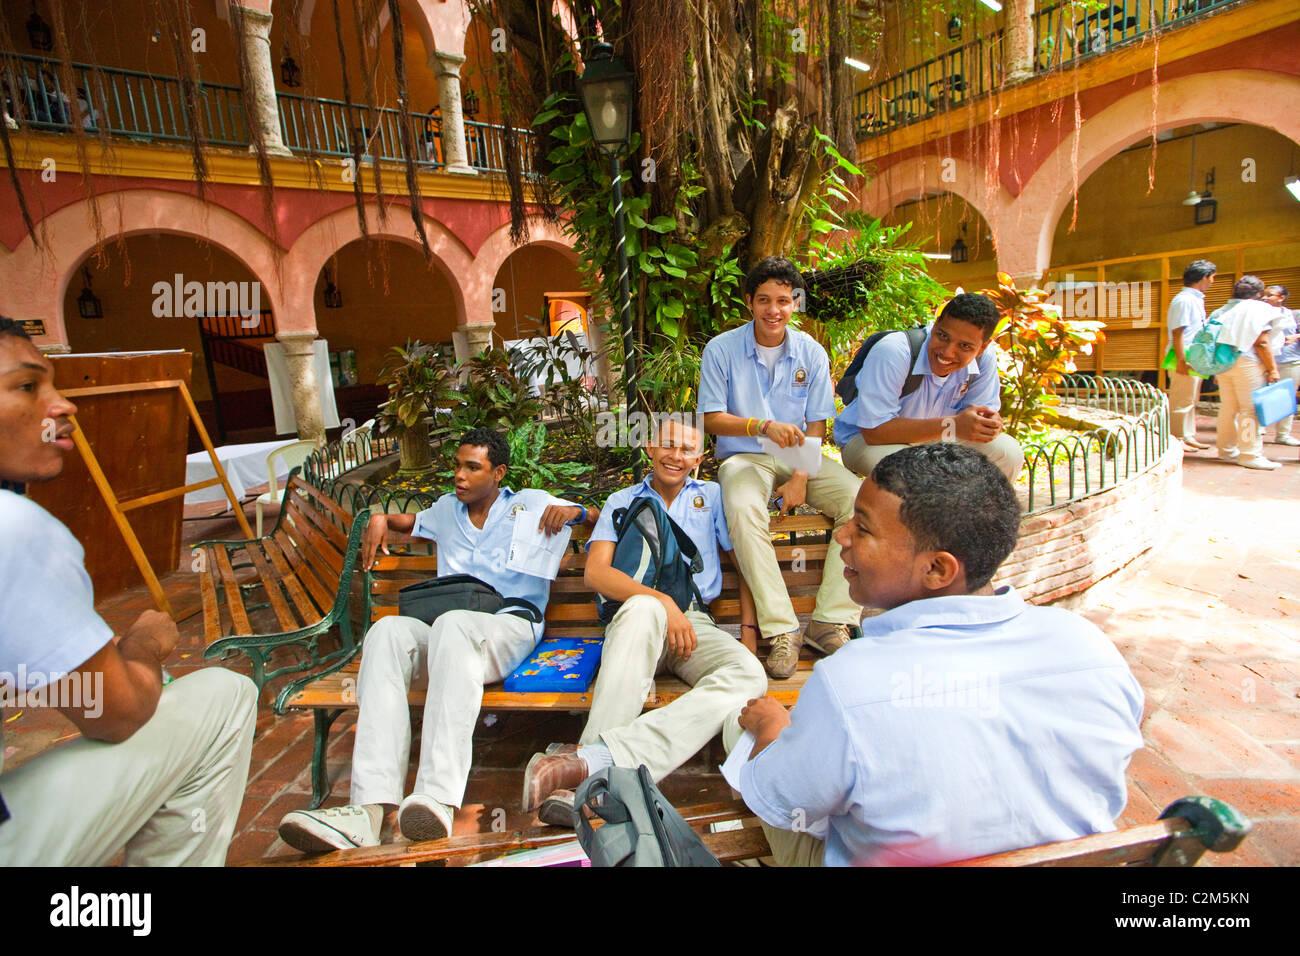 Students at Rafael Nunez University, Cartagena, Colombia - Stock Image